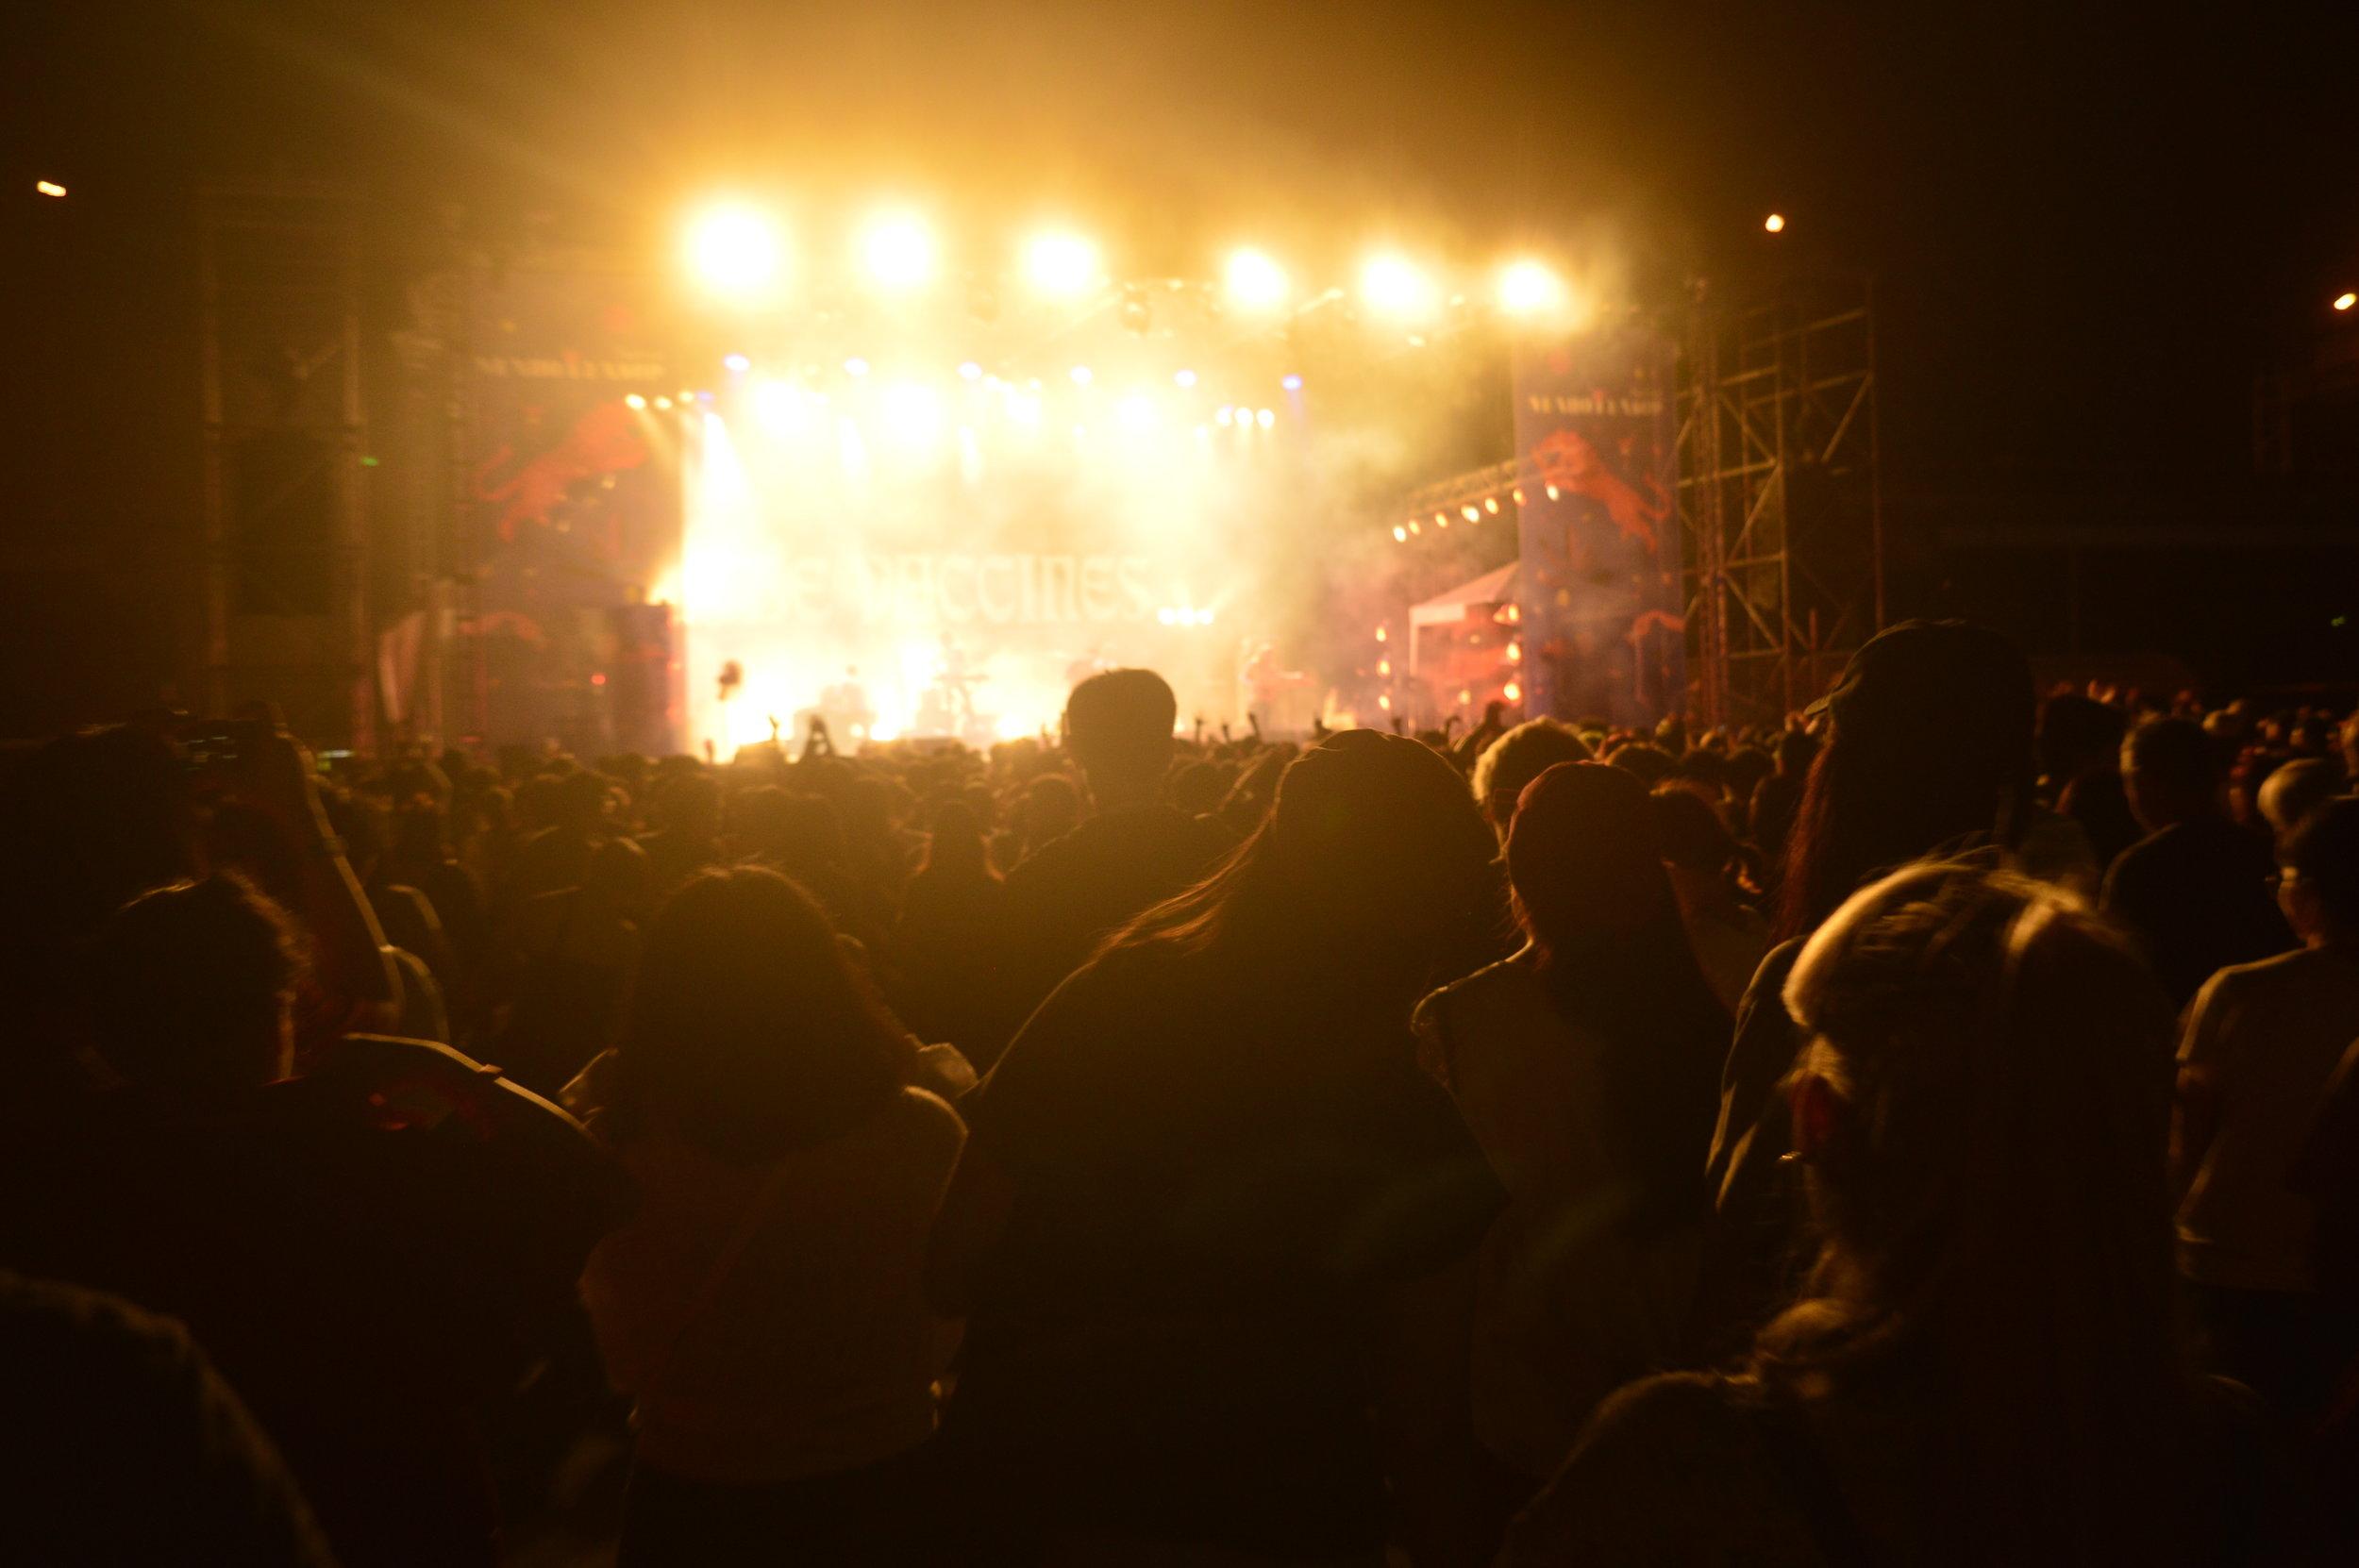 026. Crowd007.JPG